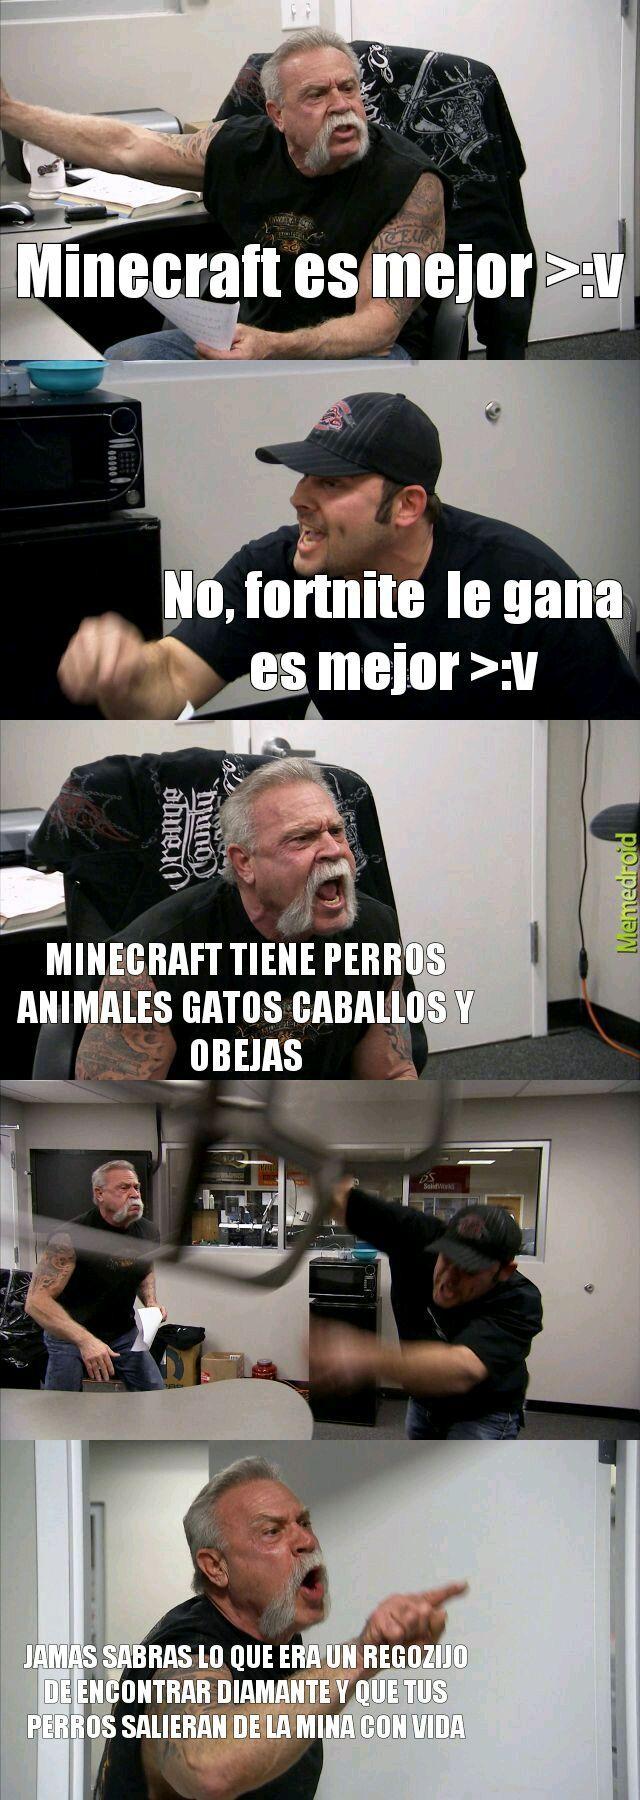 Jueguen maincraft - meme